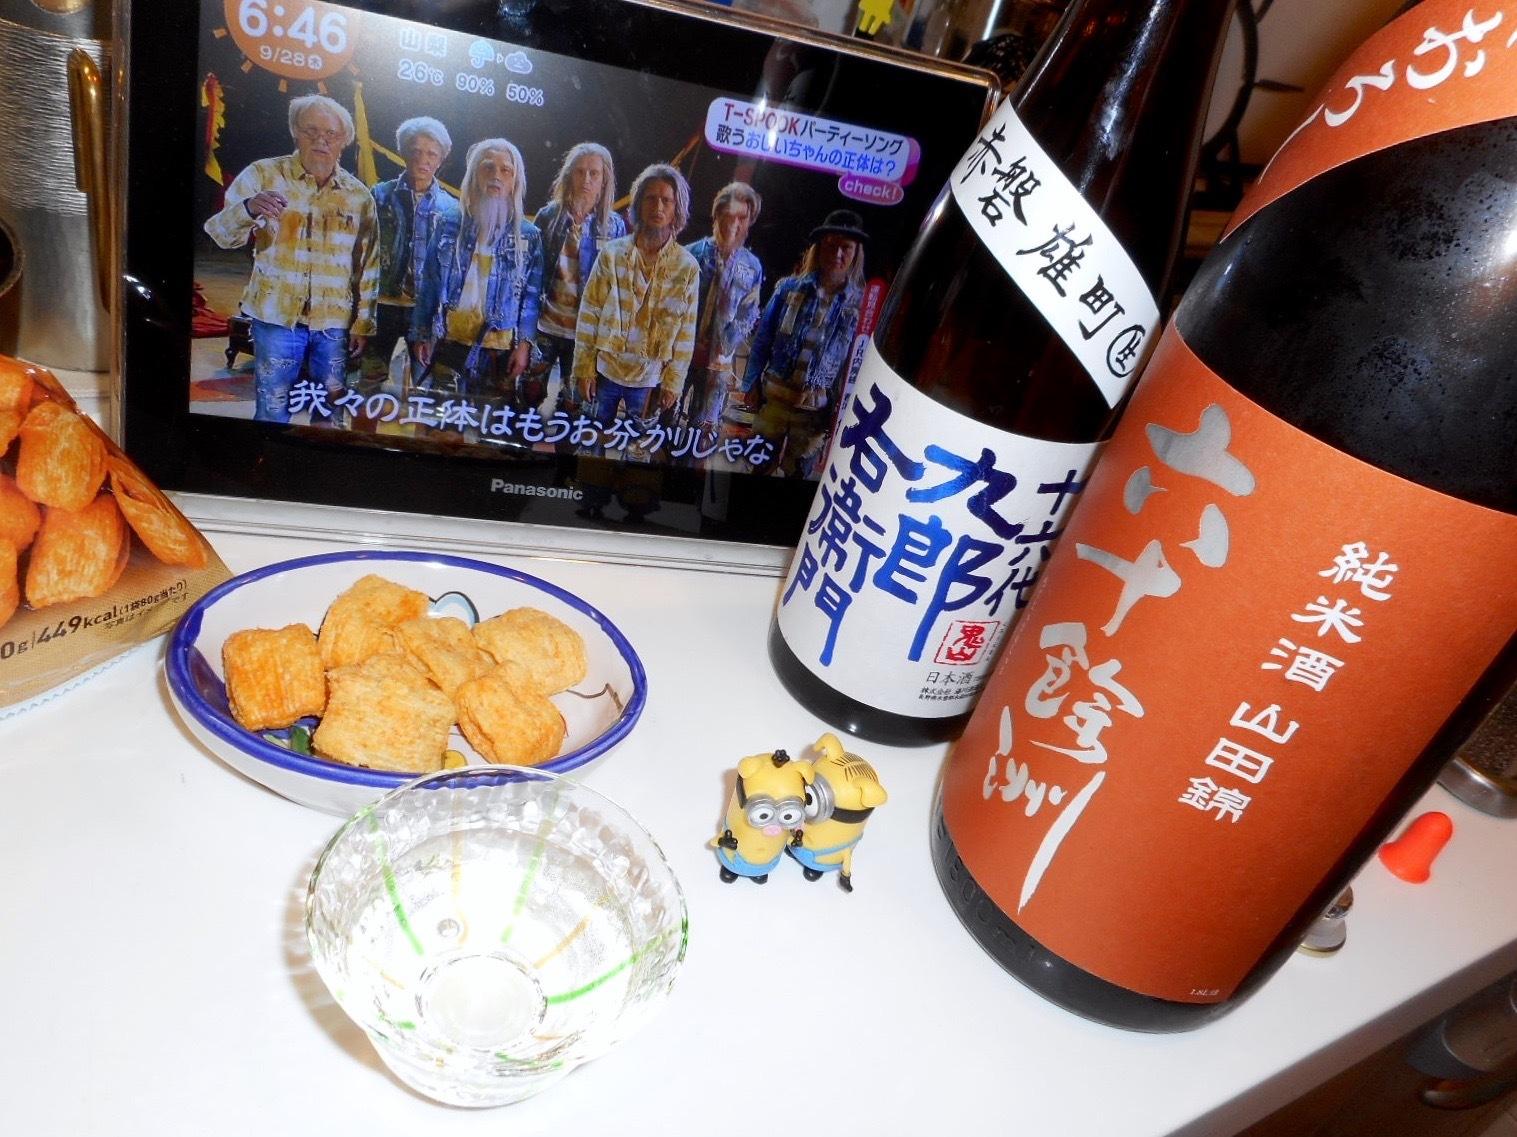 kuroemon_yamahai_omachi28by12.jpg